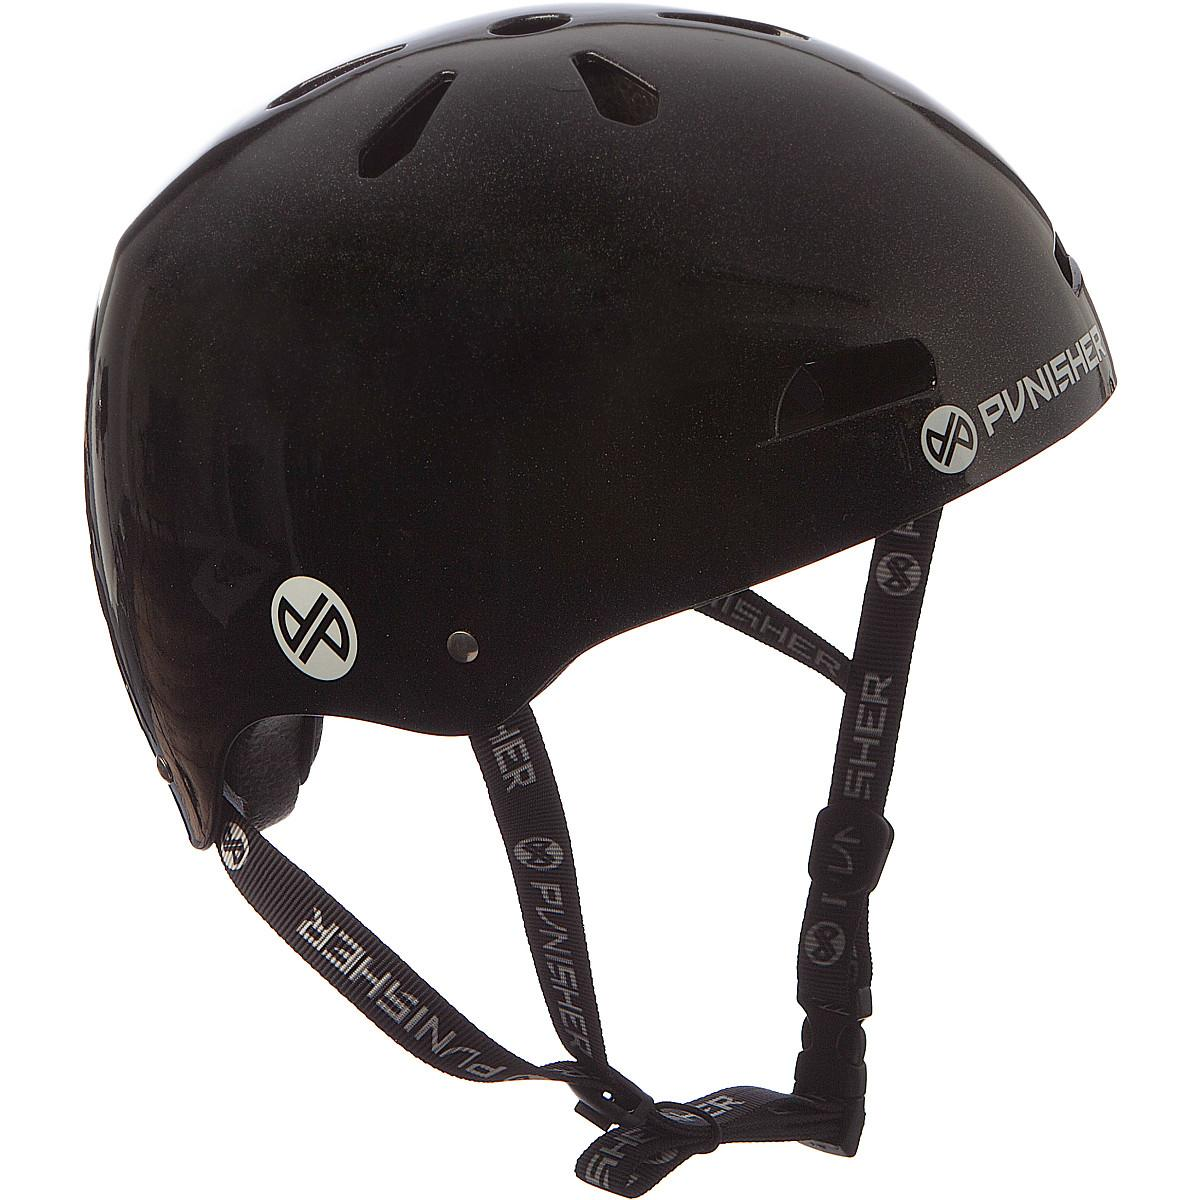 Skateboards Helmet BMX Bike Skateboard Pro Series 13-Vent Dual Safety Certified